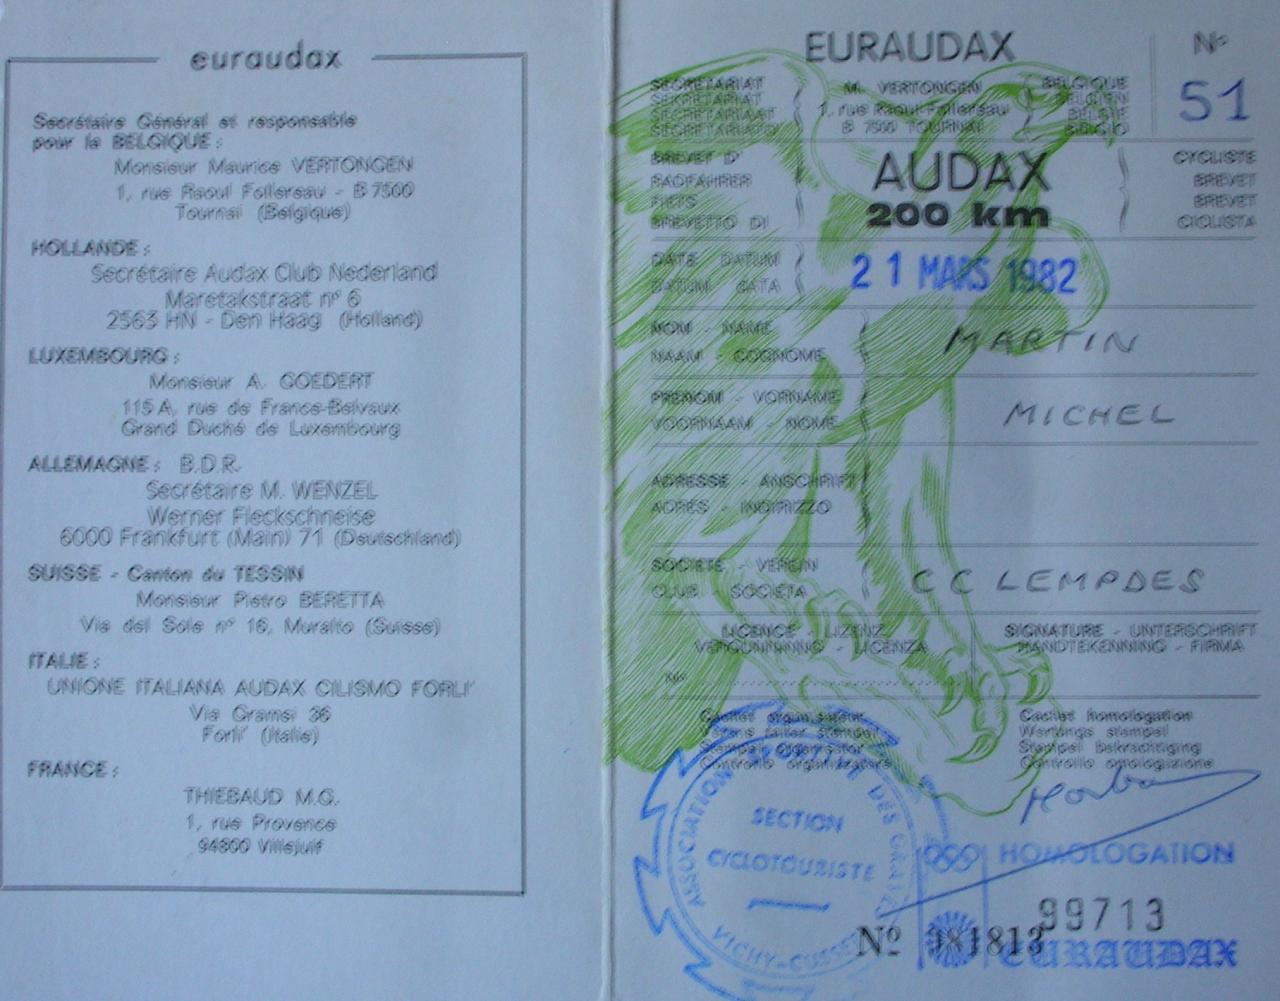 1982-brevet-audax-de-200-kms.jpg